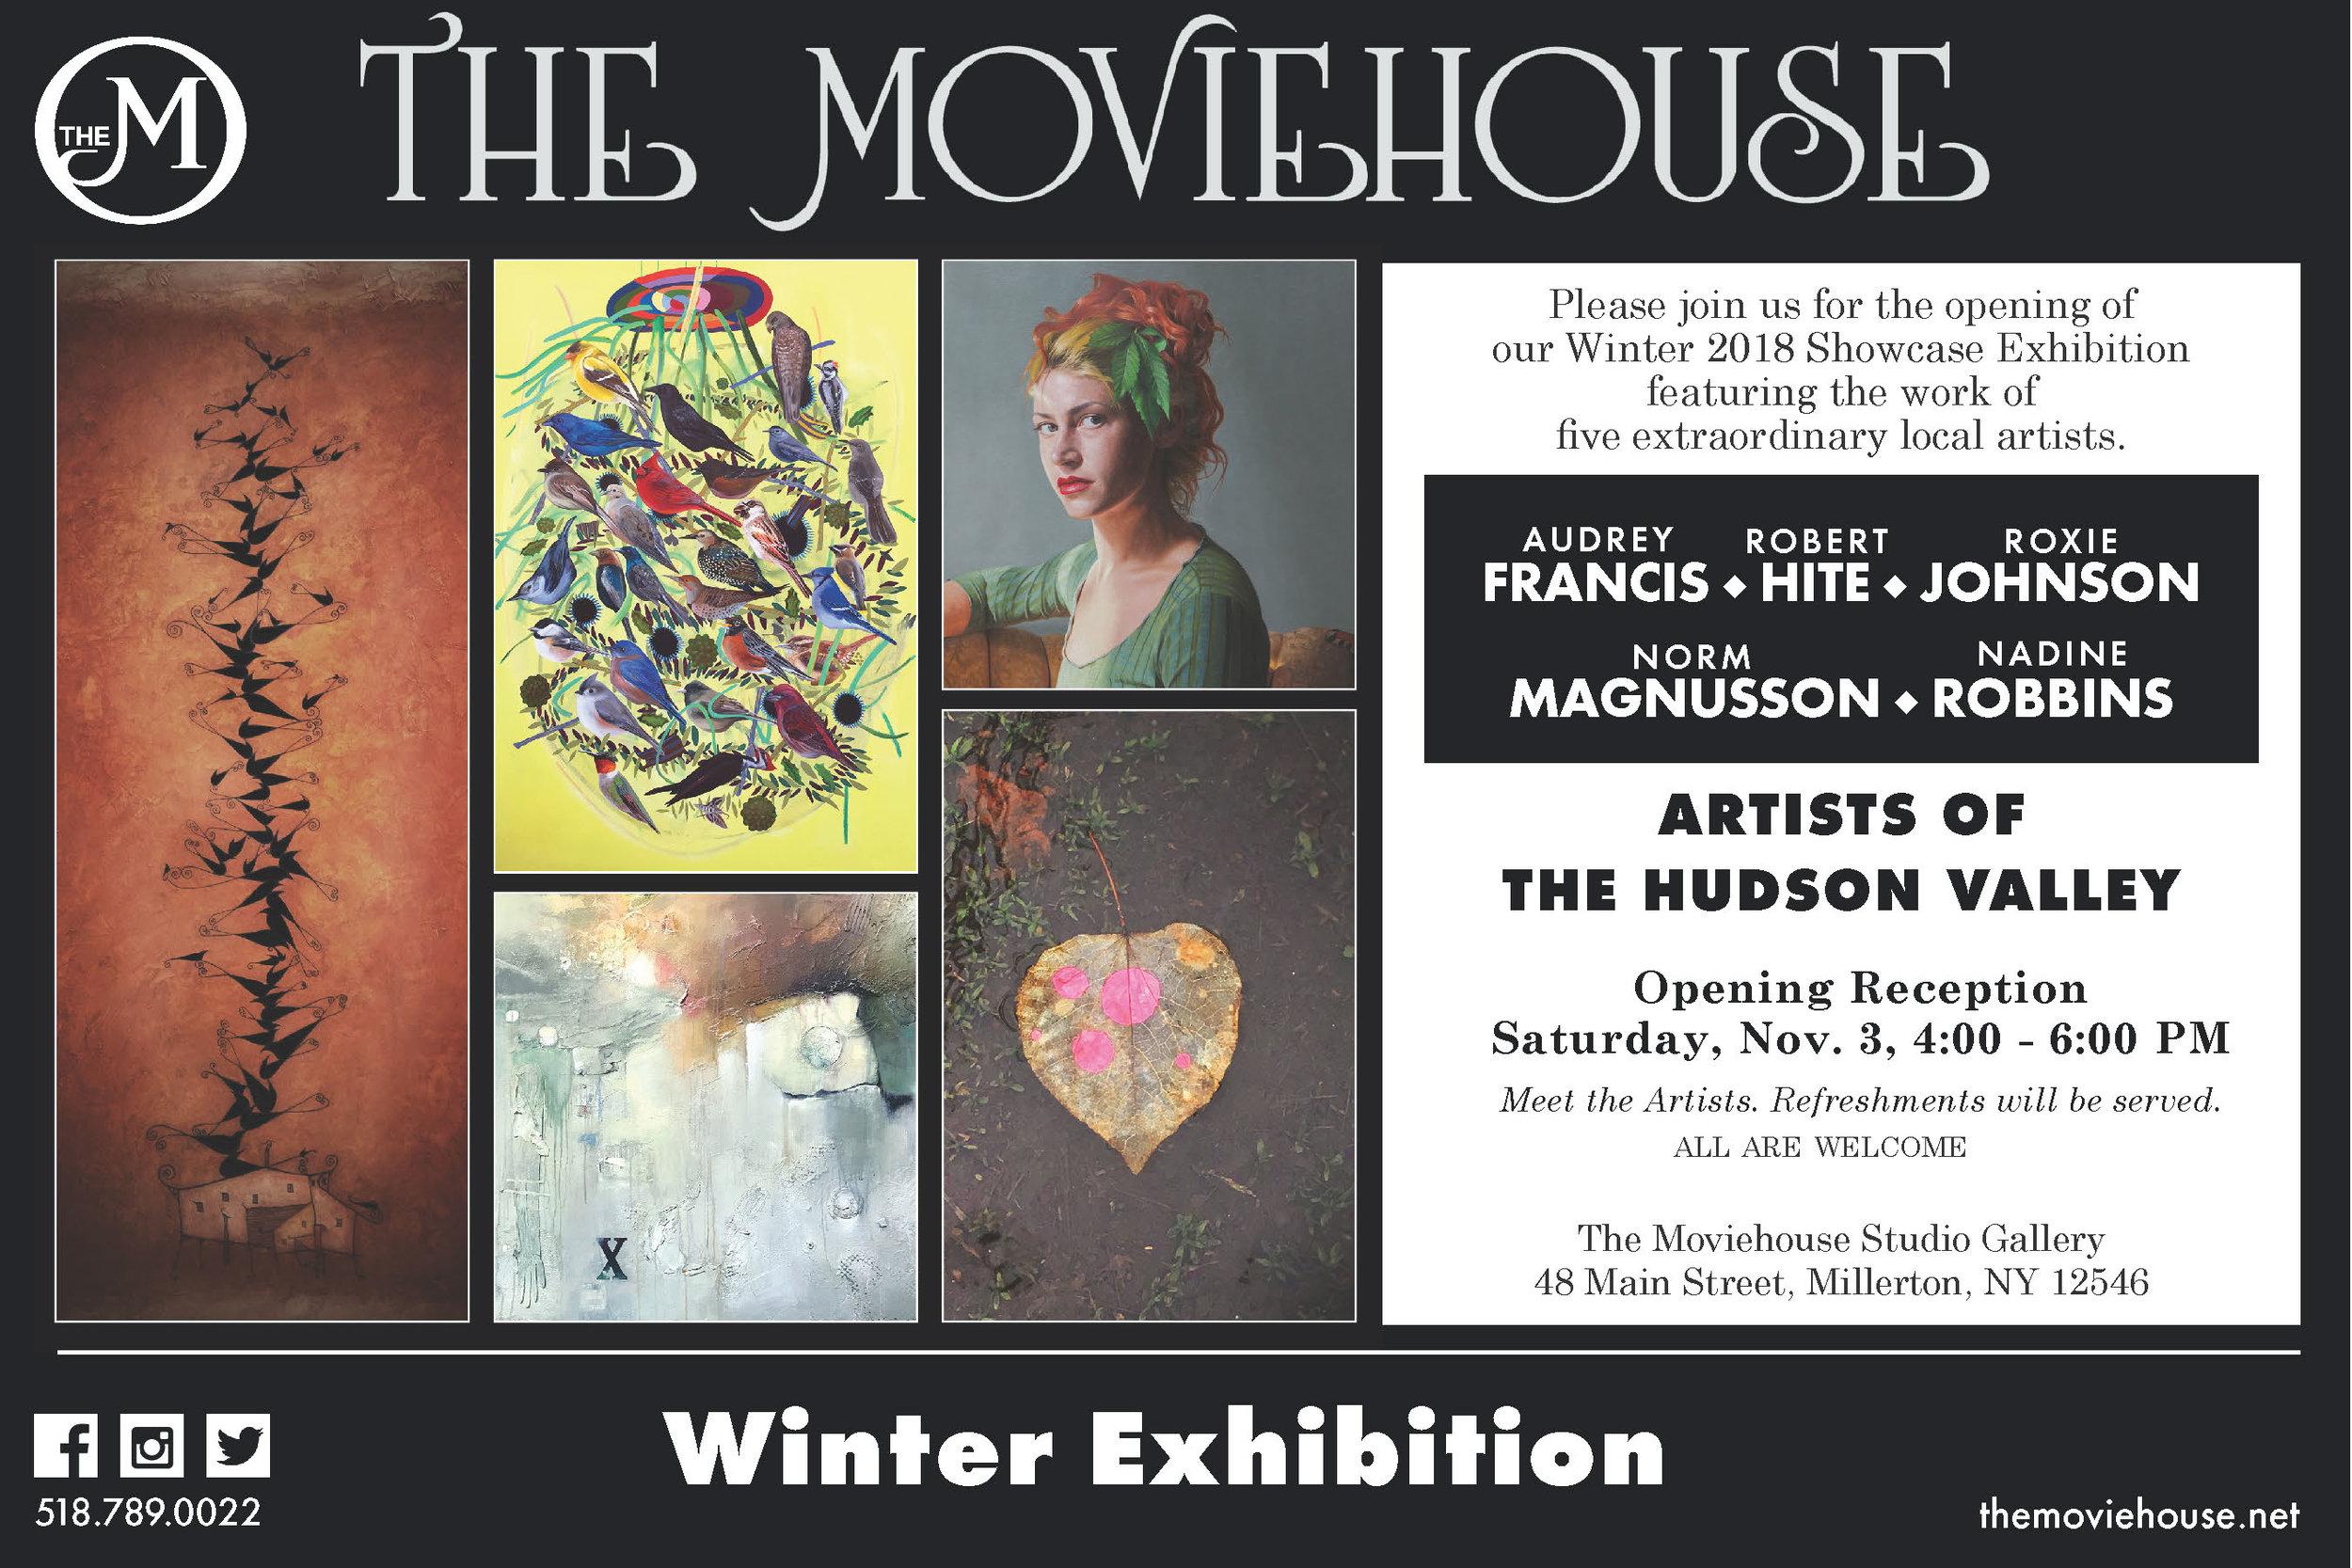 Winter Exhibition Invitation.jpg